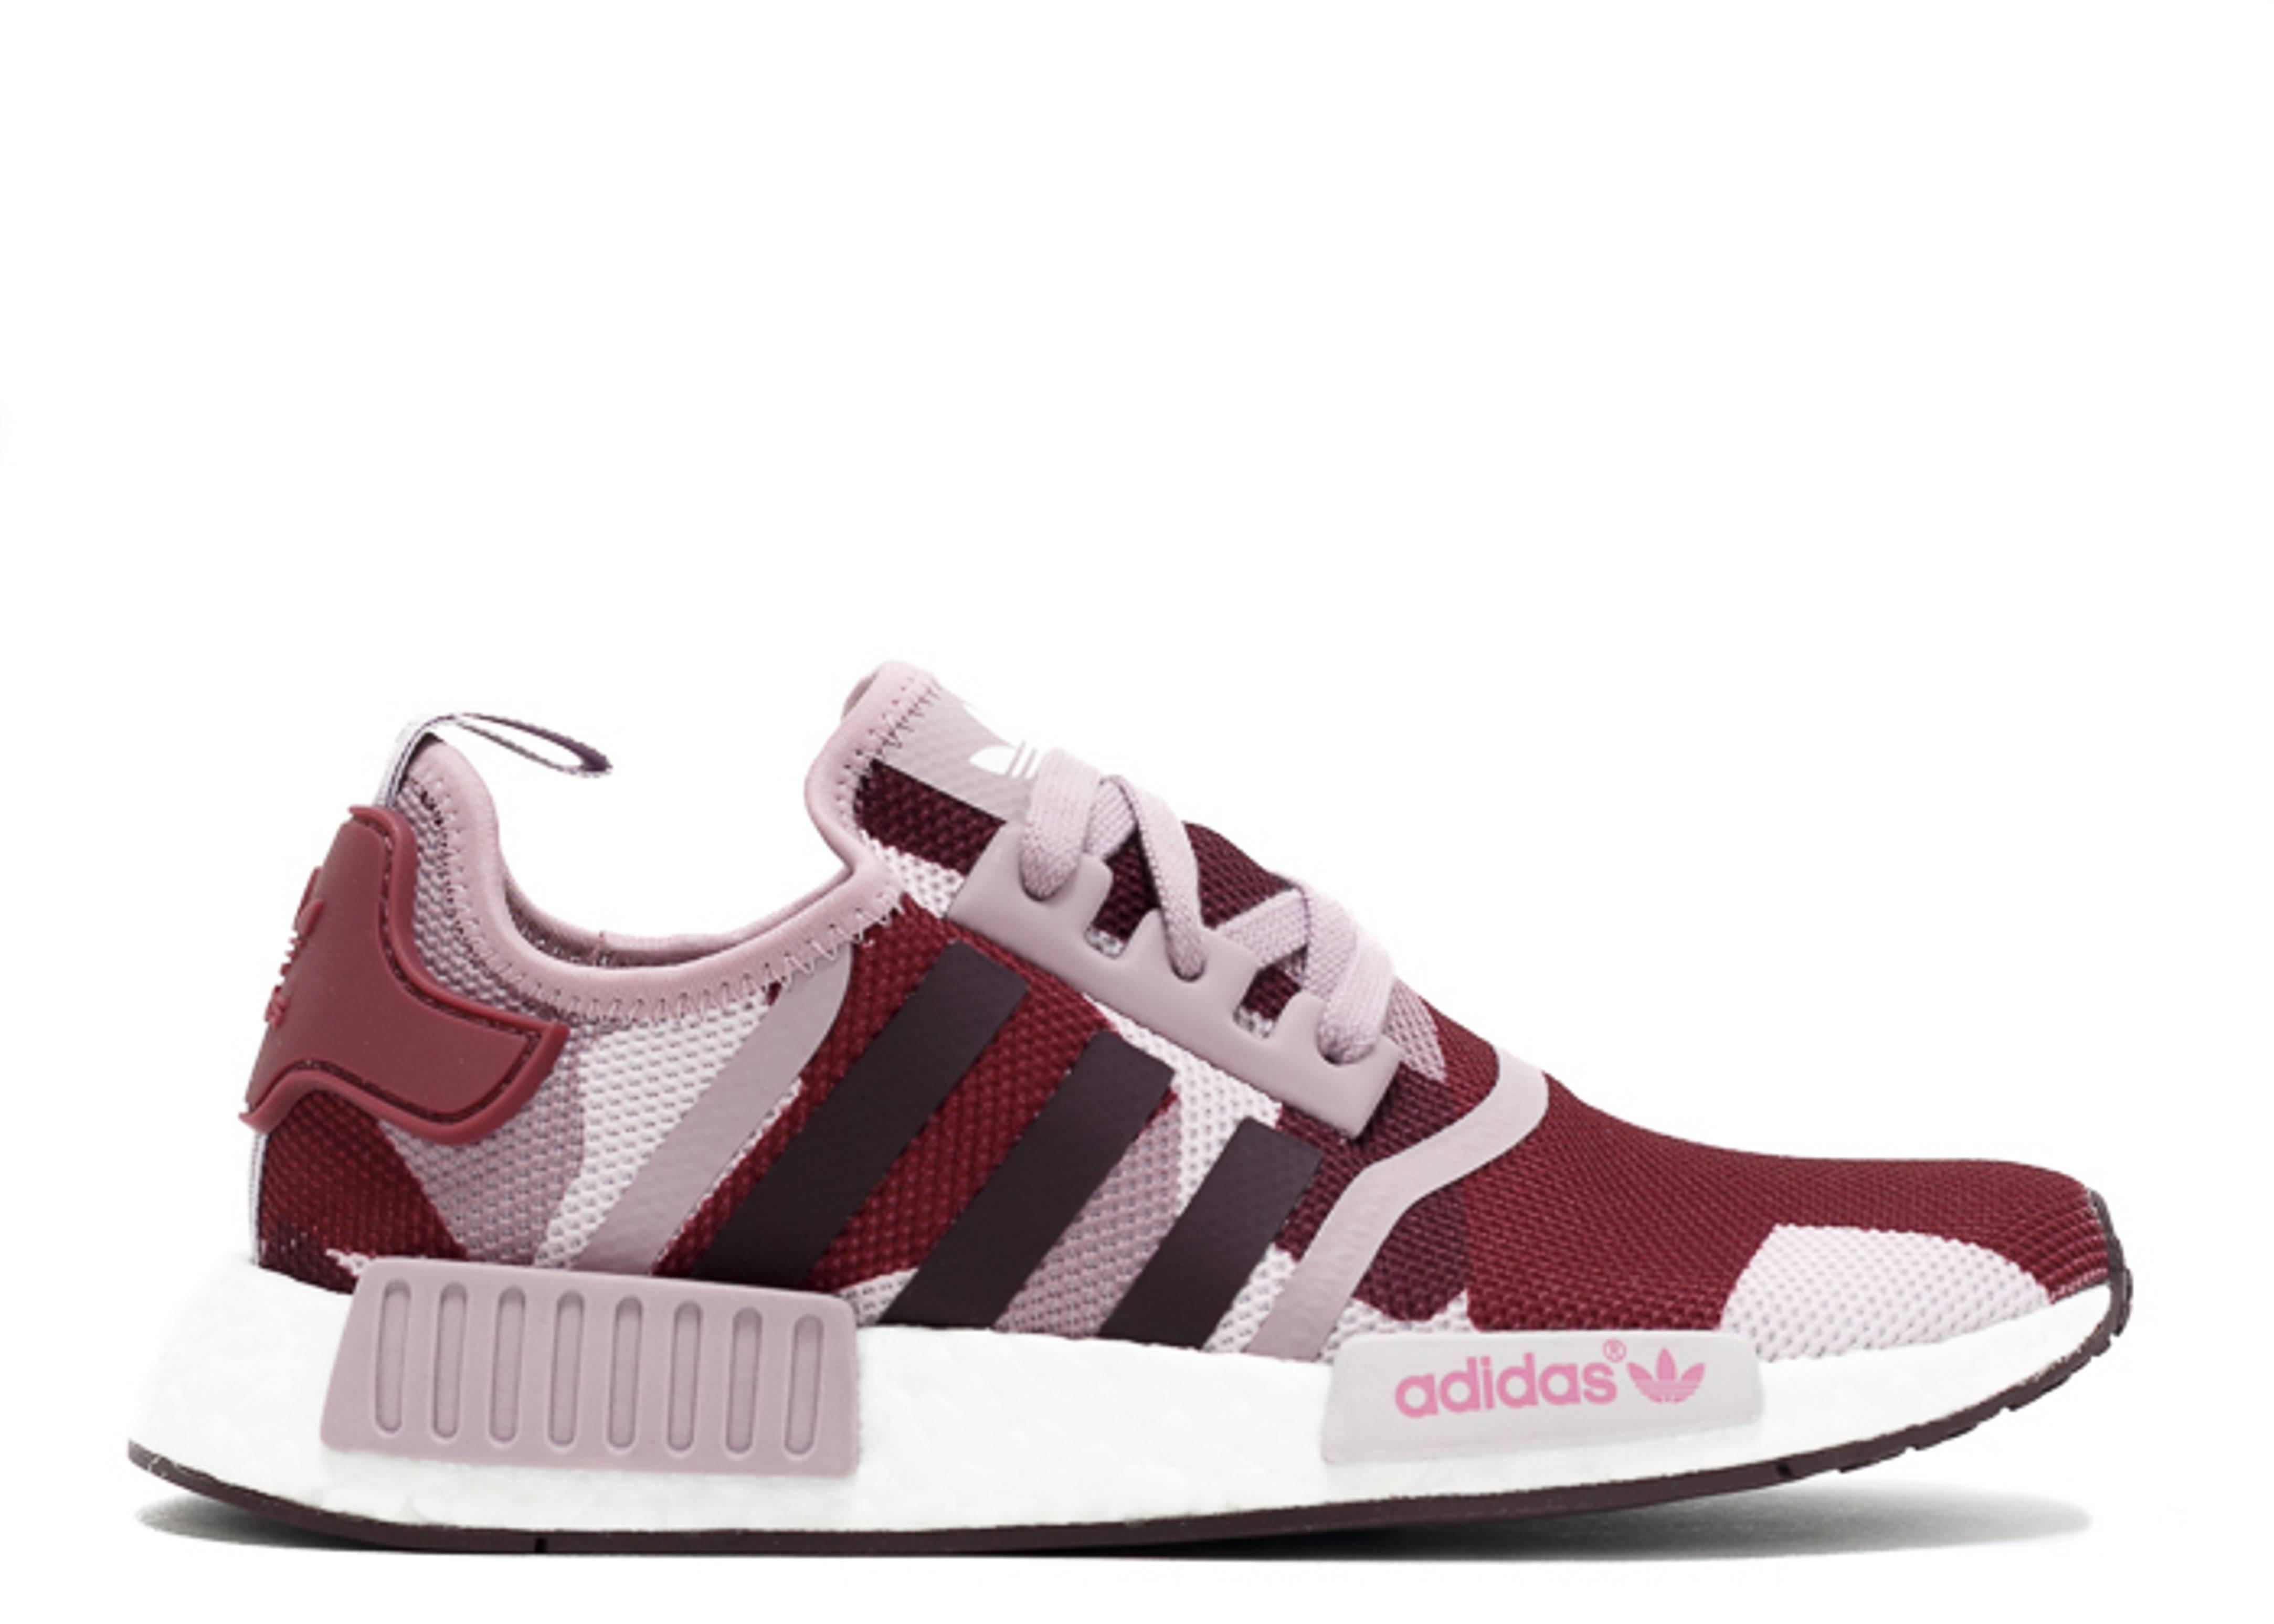 fdd48e66ecb42 Nmd R1 W - Adidas - s75721 - blanch purple  white